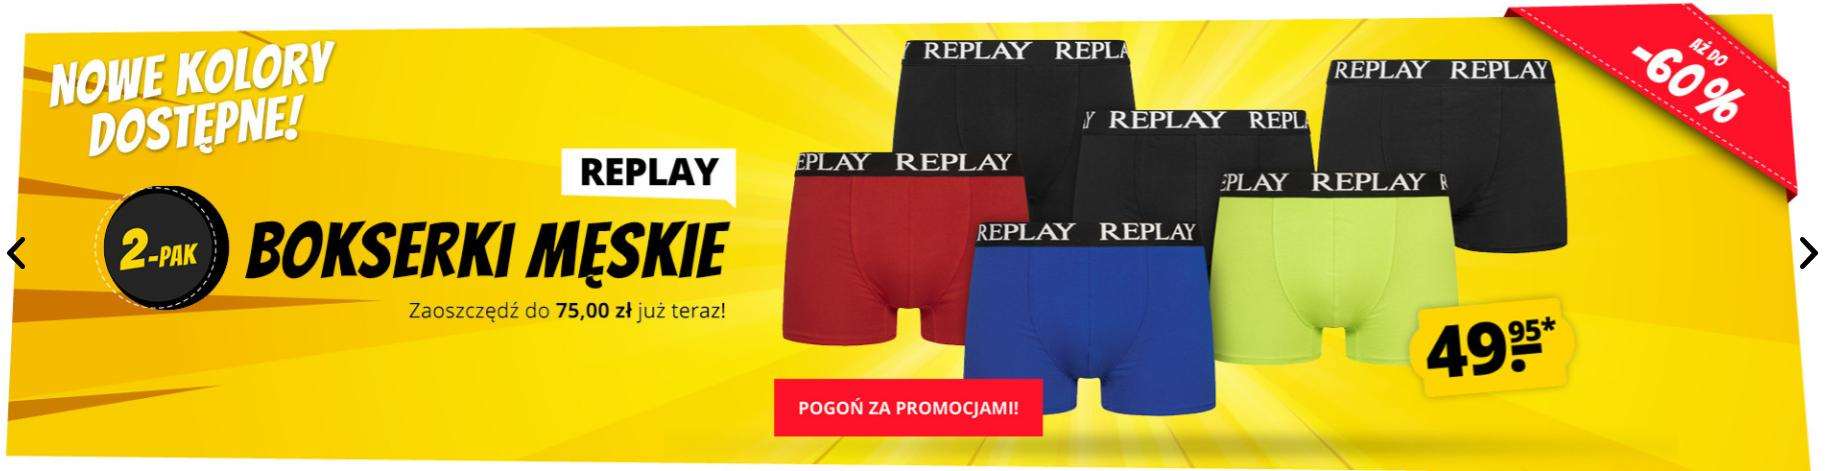 Sport Rabat Sport Rabat: do 60% rabatu na bokserki męskie marki Replay